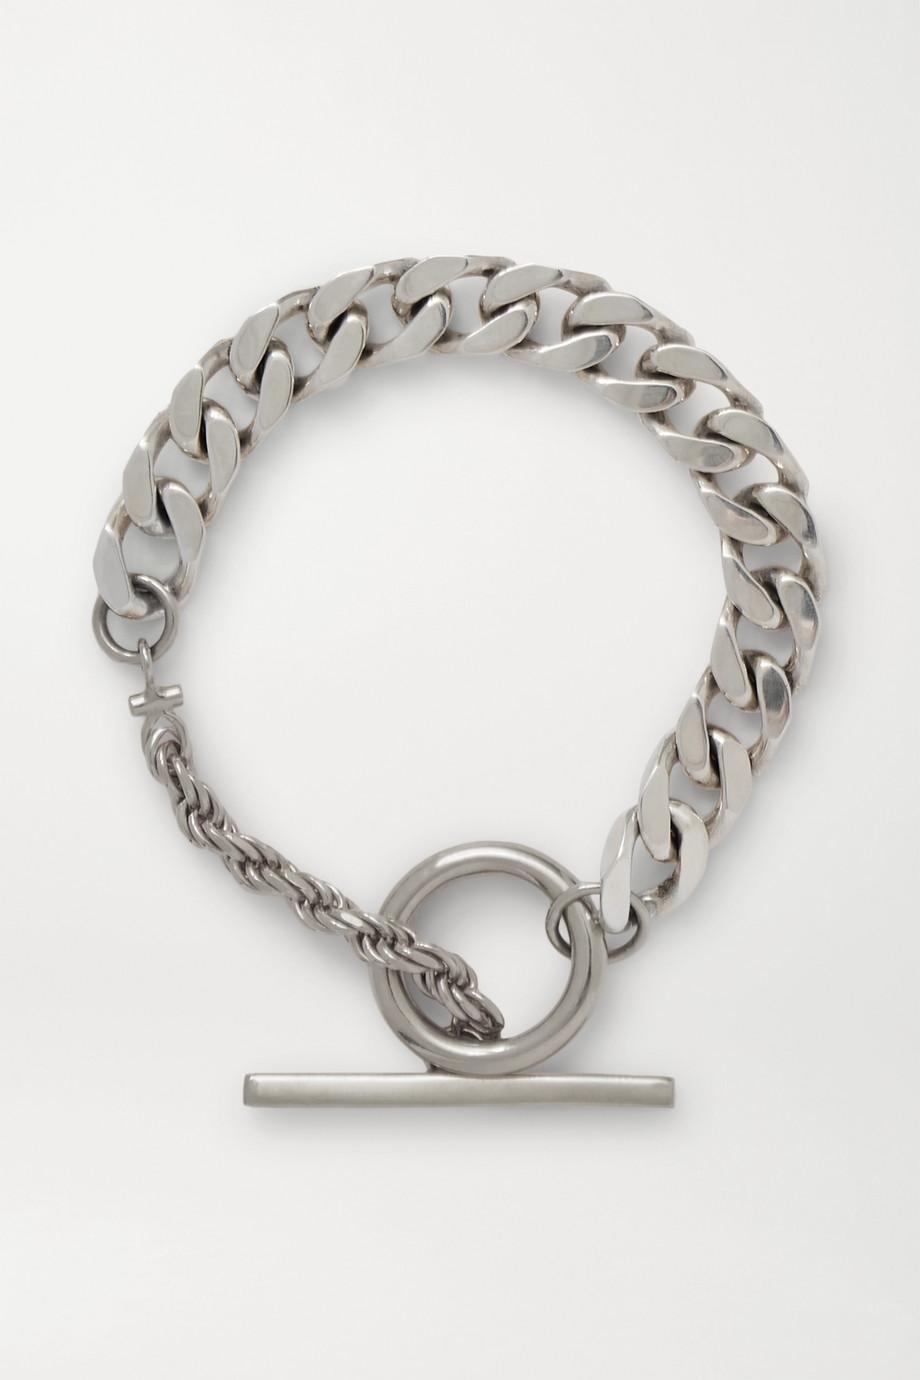 Bottega Veneta Silberfarbenes Armband